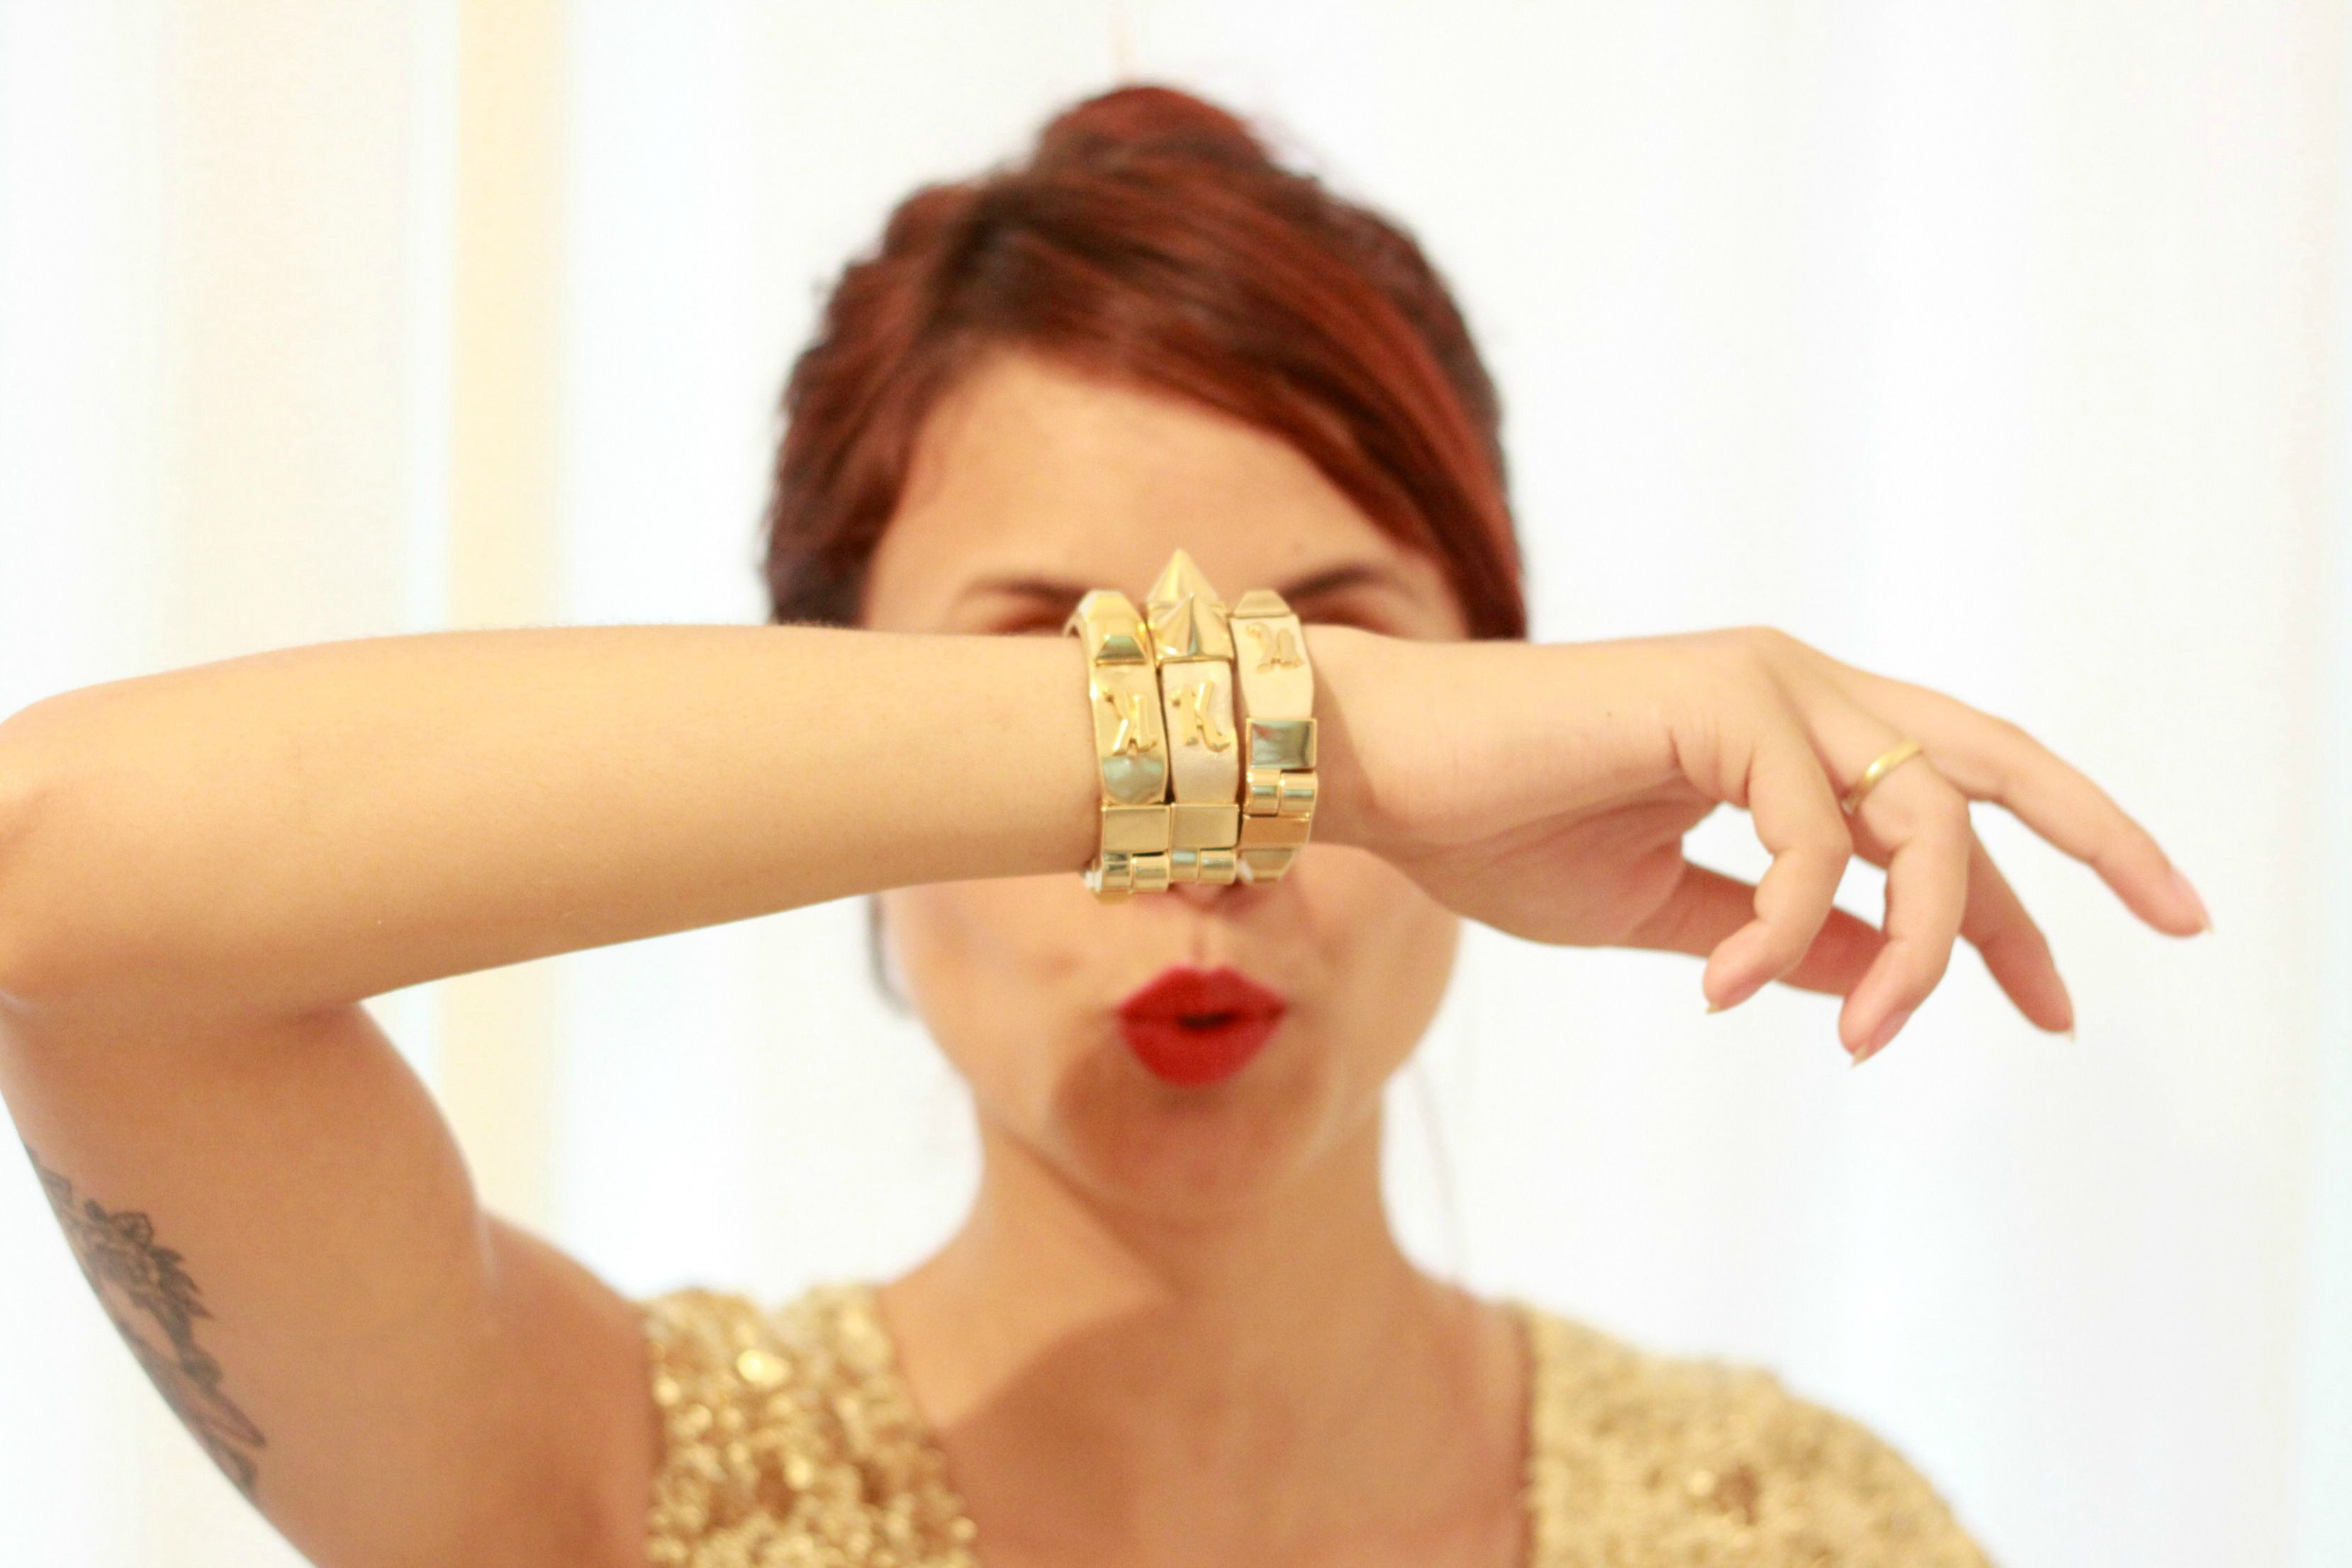 Romwe Golden Dress, Bottero Boots, Kafé Acessórios Bracelets - Hello 2014! - Glena Martins | LOOKBOOK